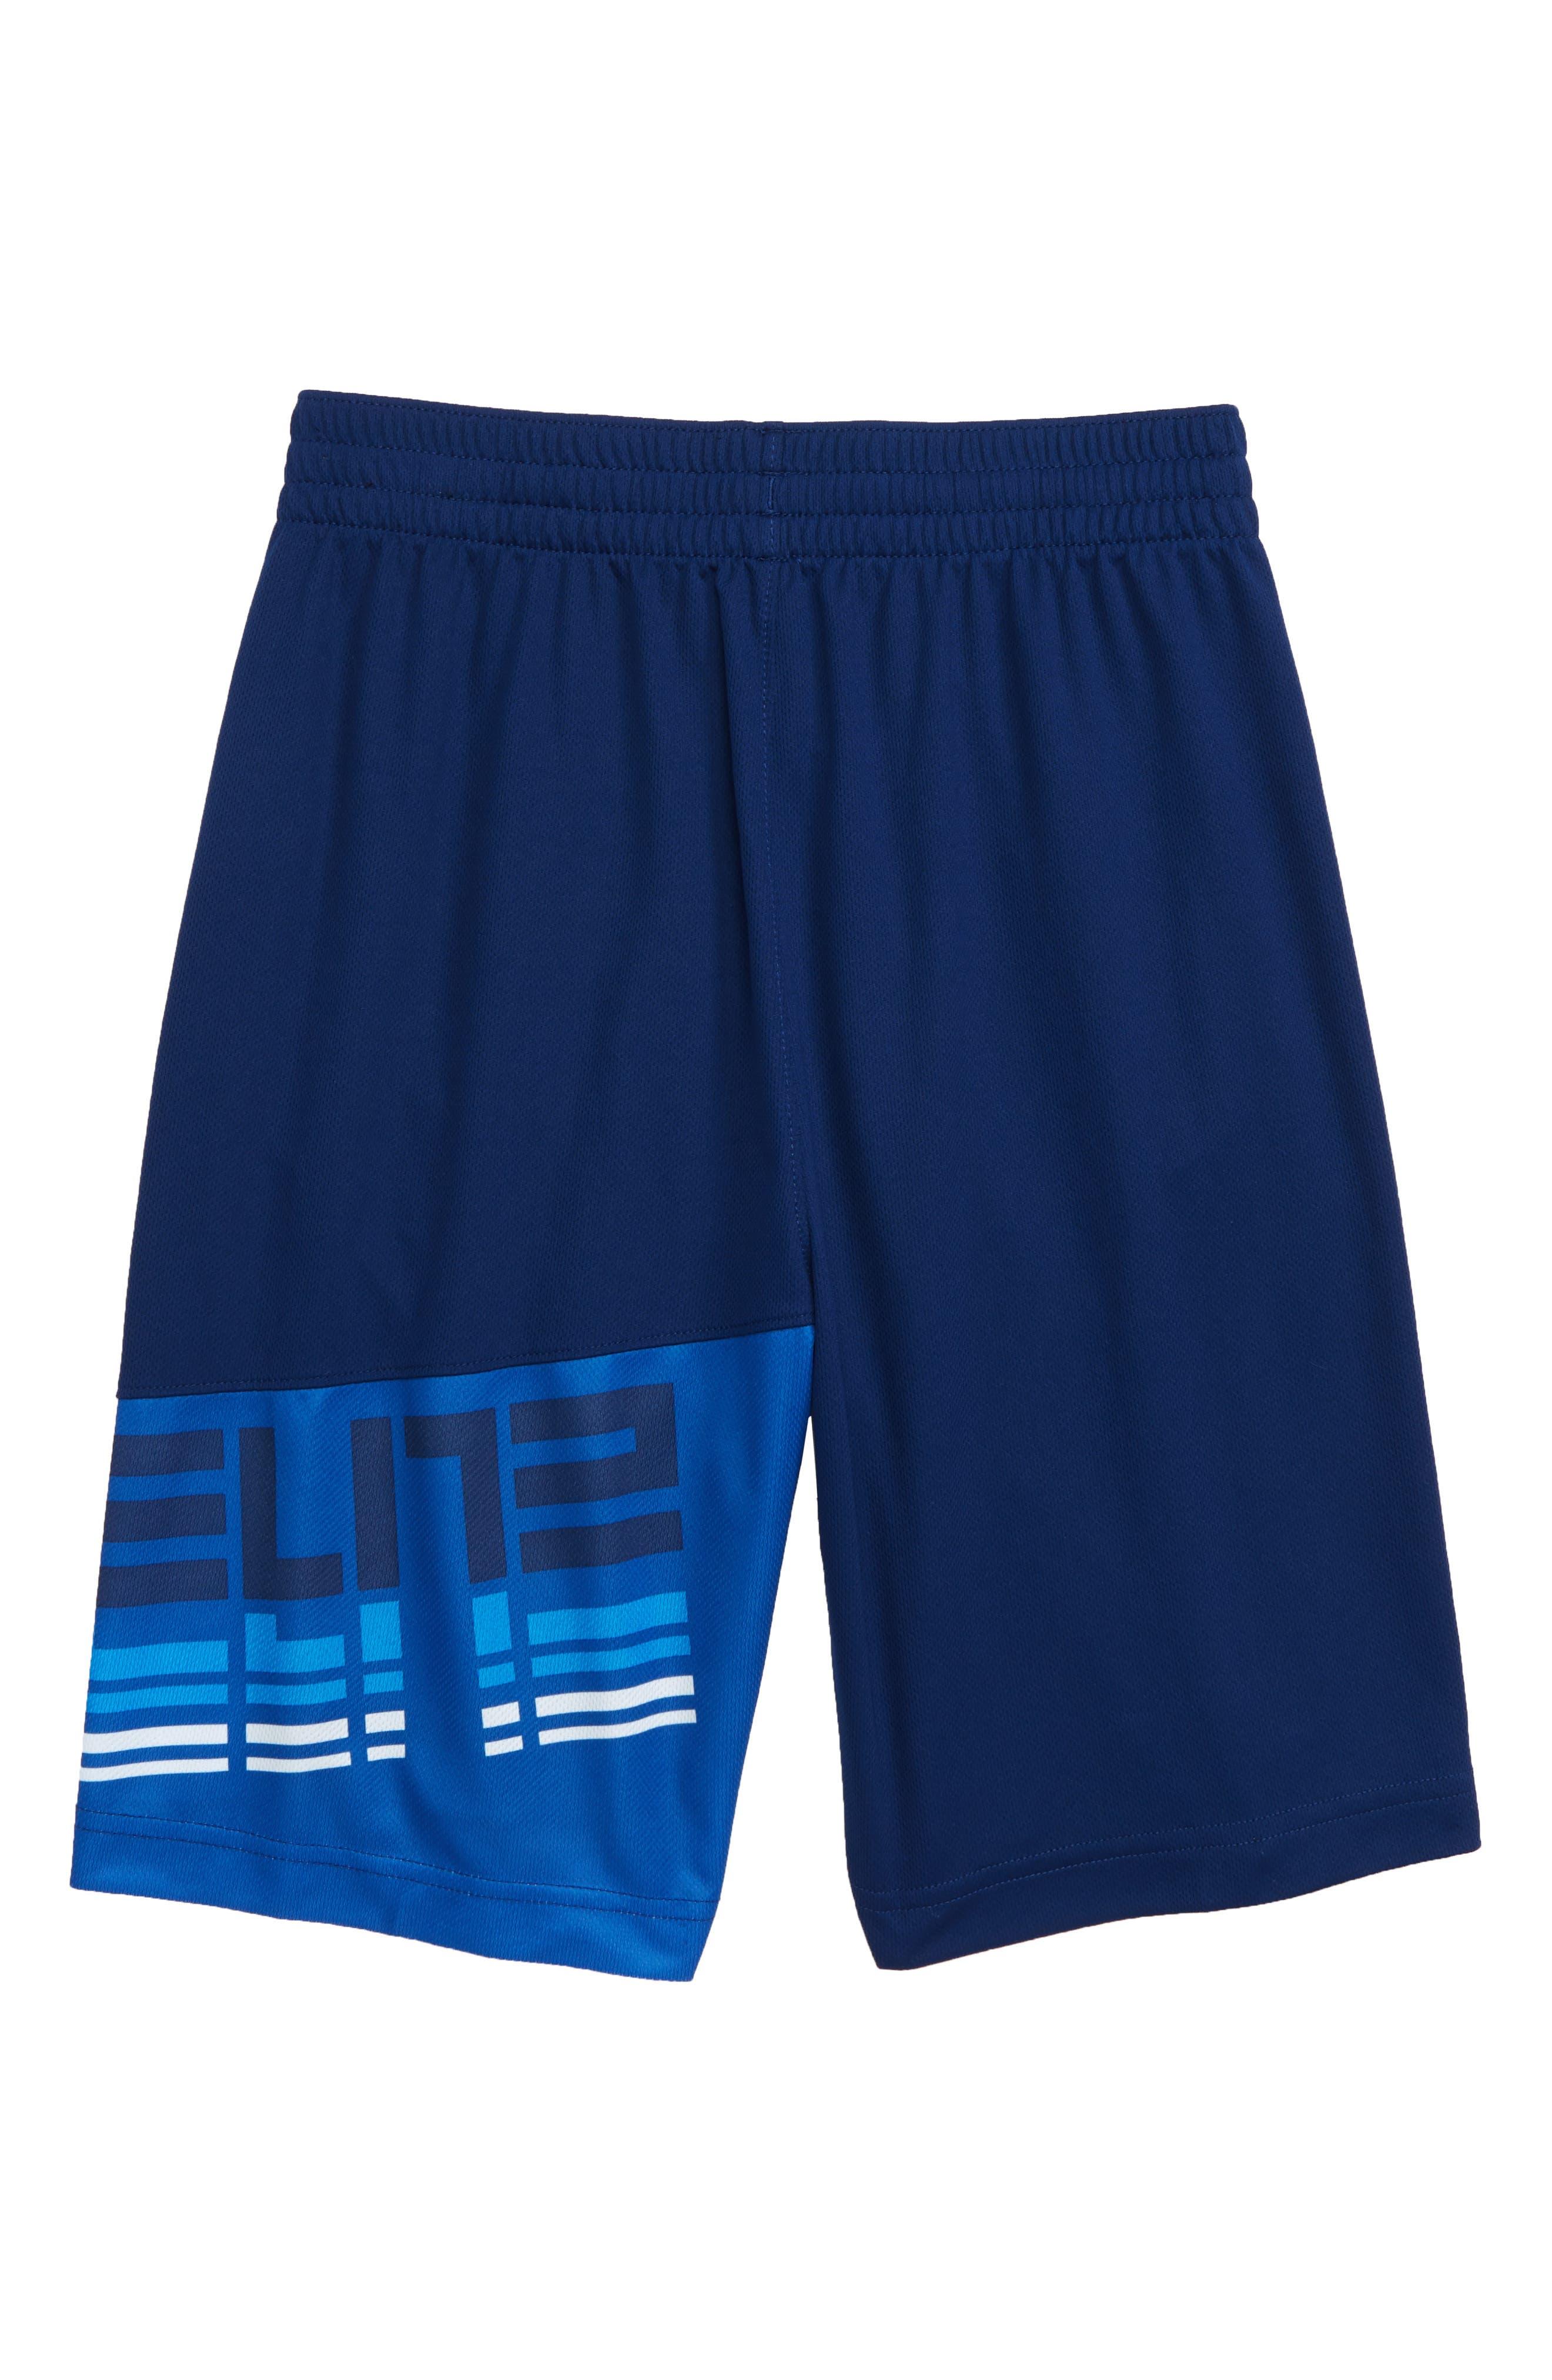 Dry Elite Athletic Shorts,                             Alternate thumbnail 2, color,                             BLUE VOID/ WHITE